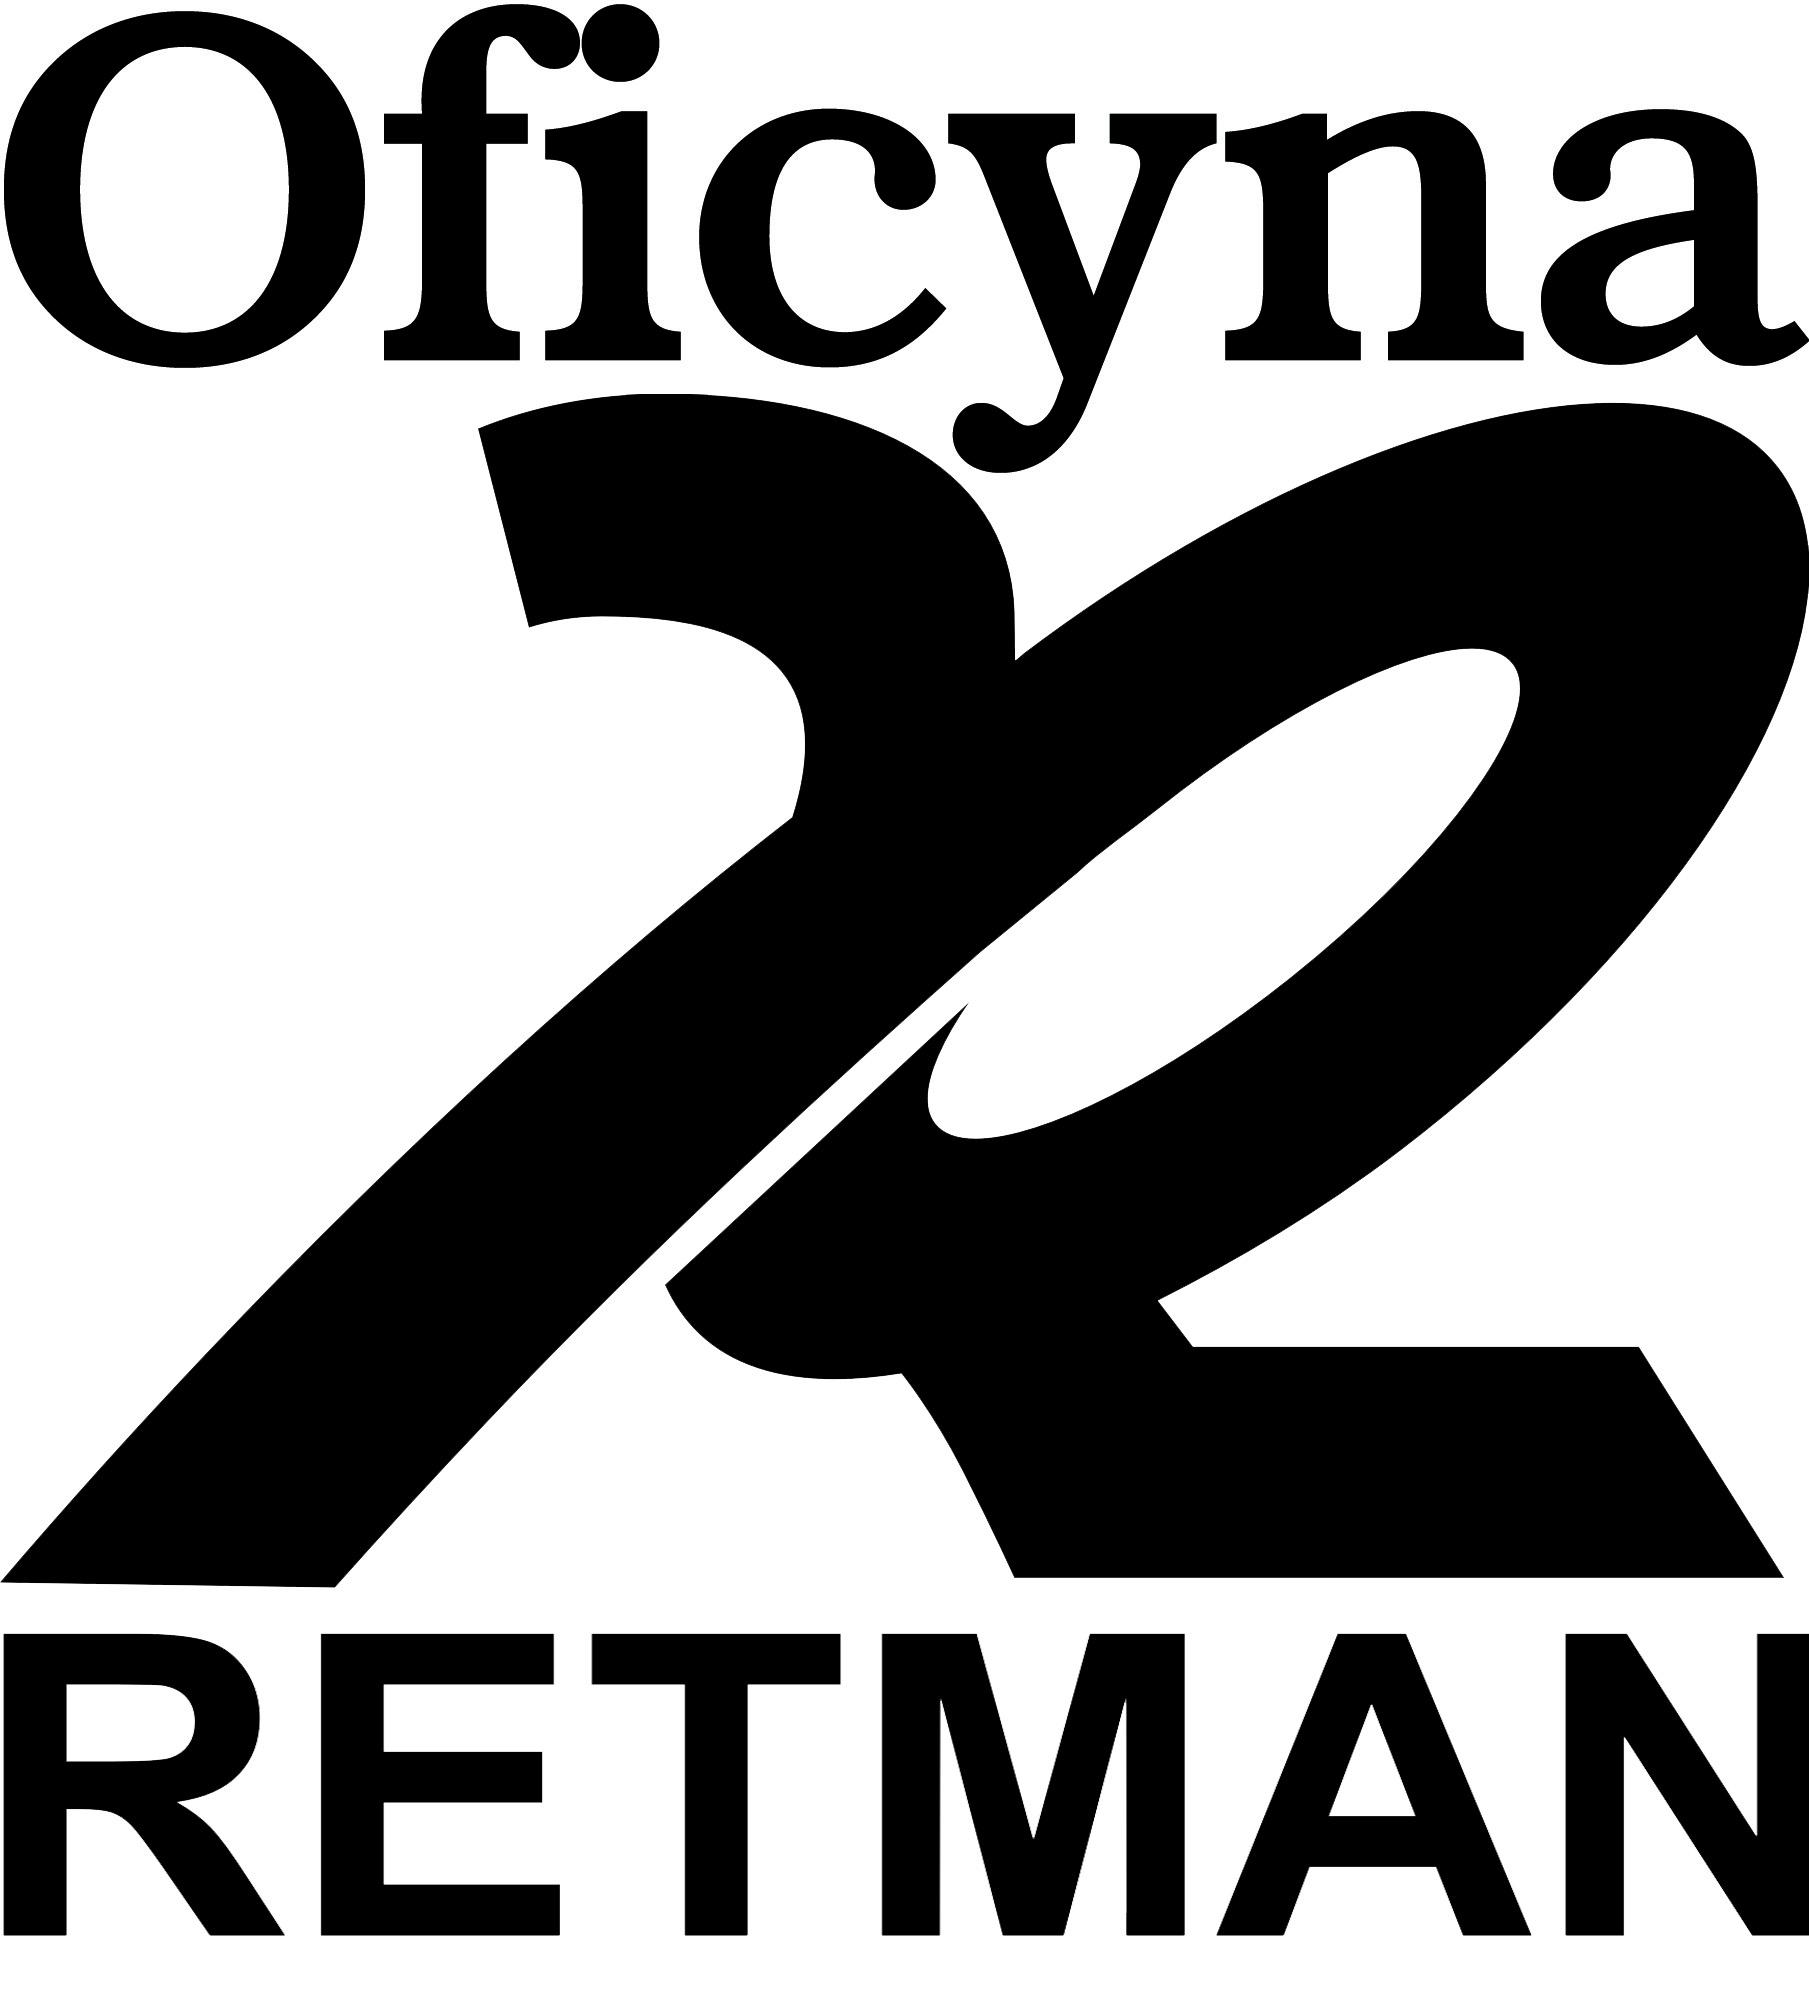 https://m.wmwm.pl/2016/11/orig/logo-oficyny-retman-5508.jpg